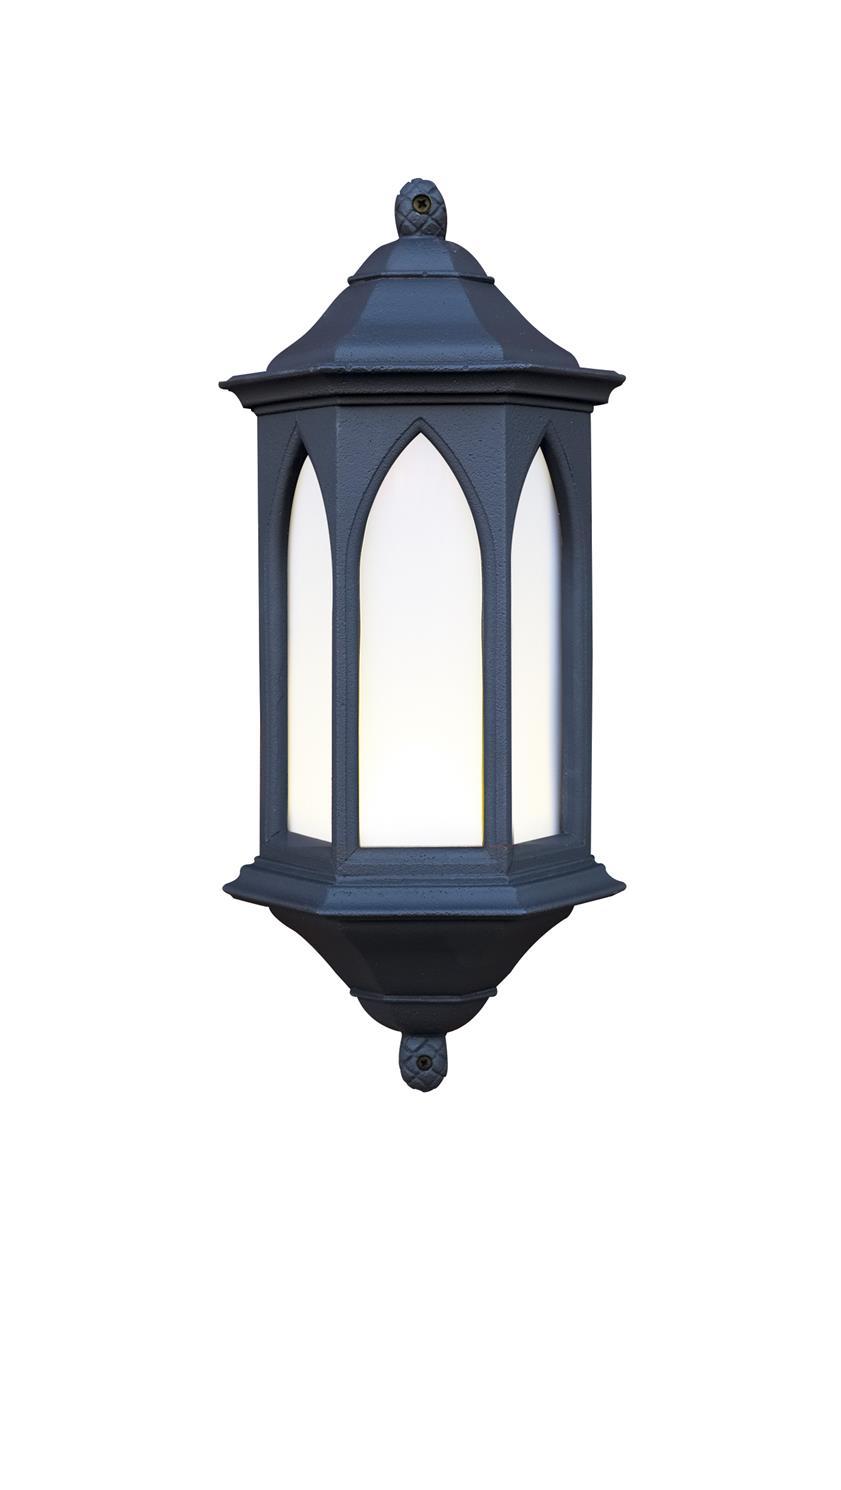 David Hunt Lighting YOR22/LE York Outdoor Half Lantern in Black Stone